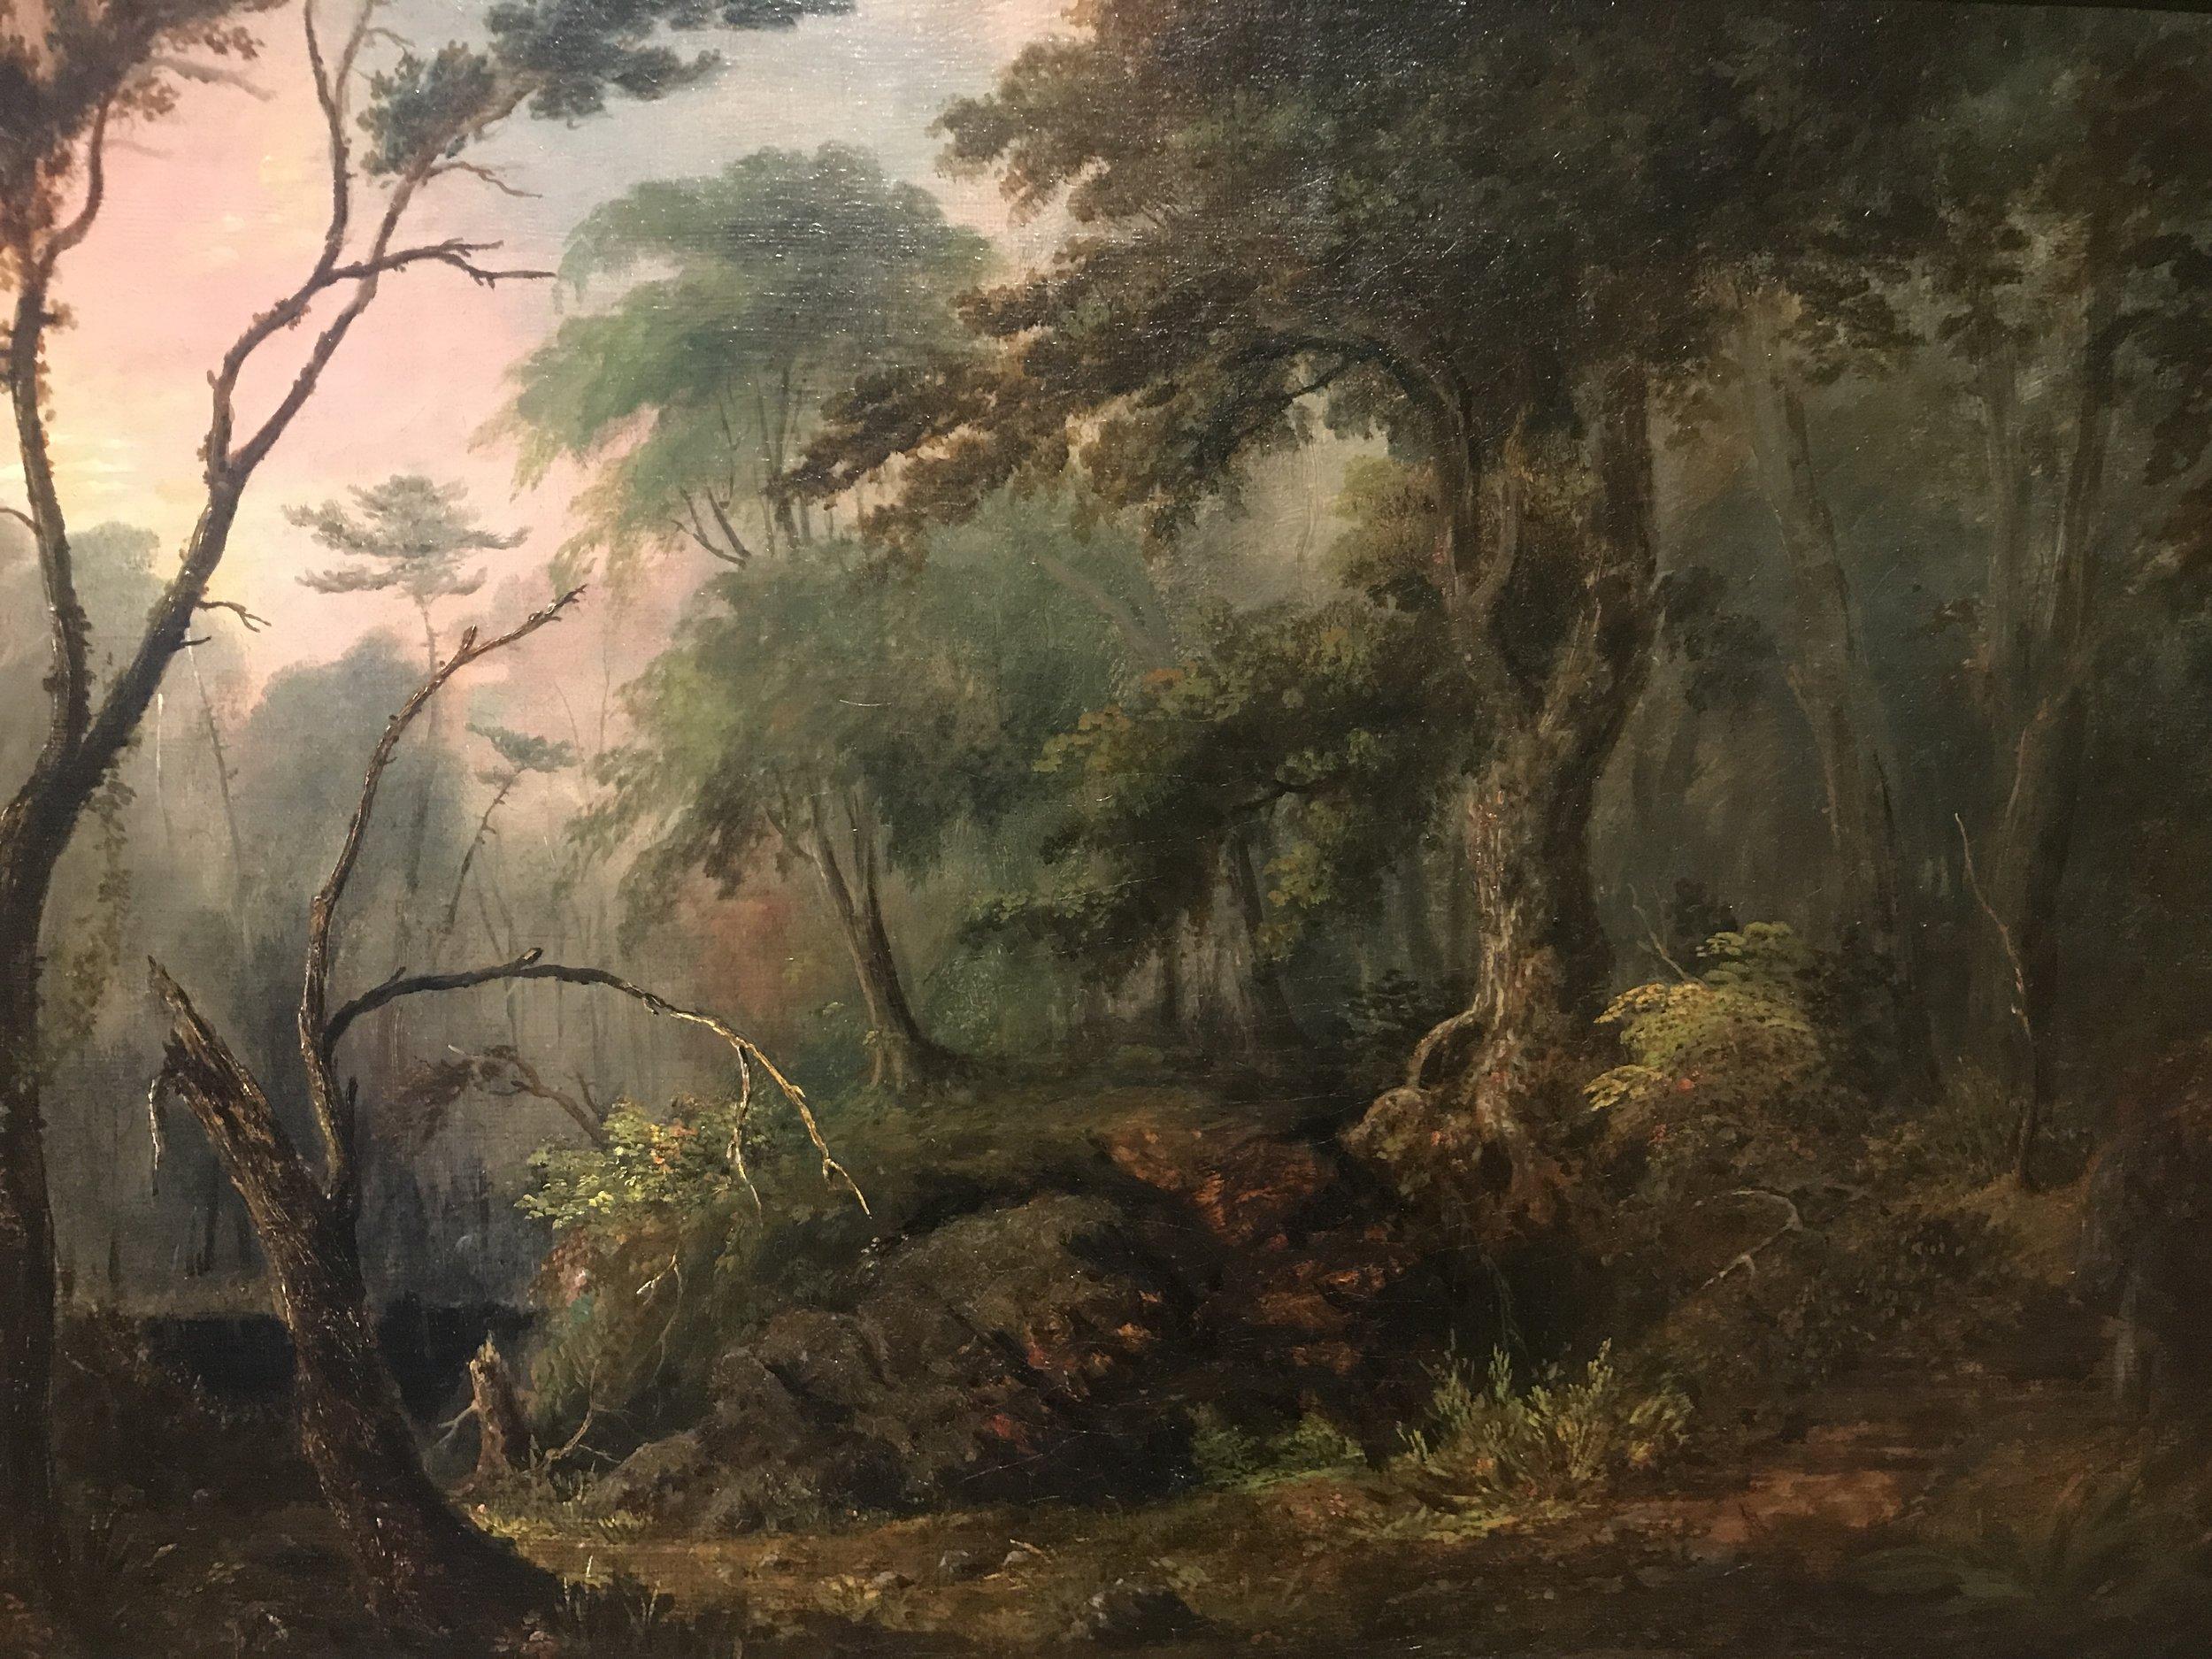 colby_college_codman_1830_forest_near_portland.JPG